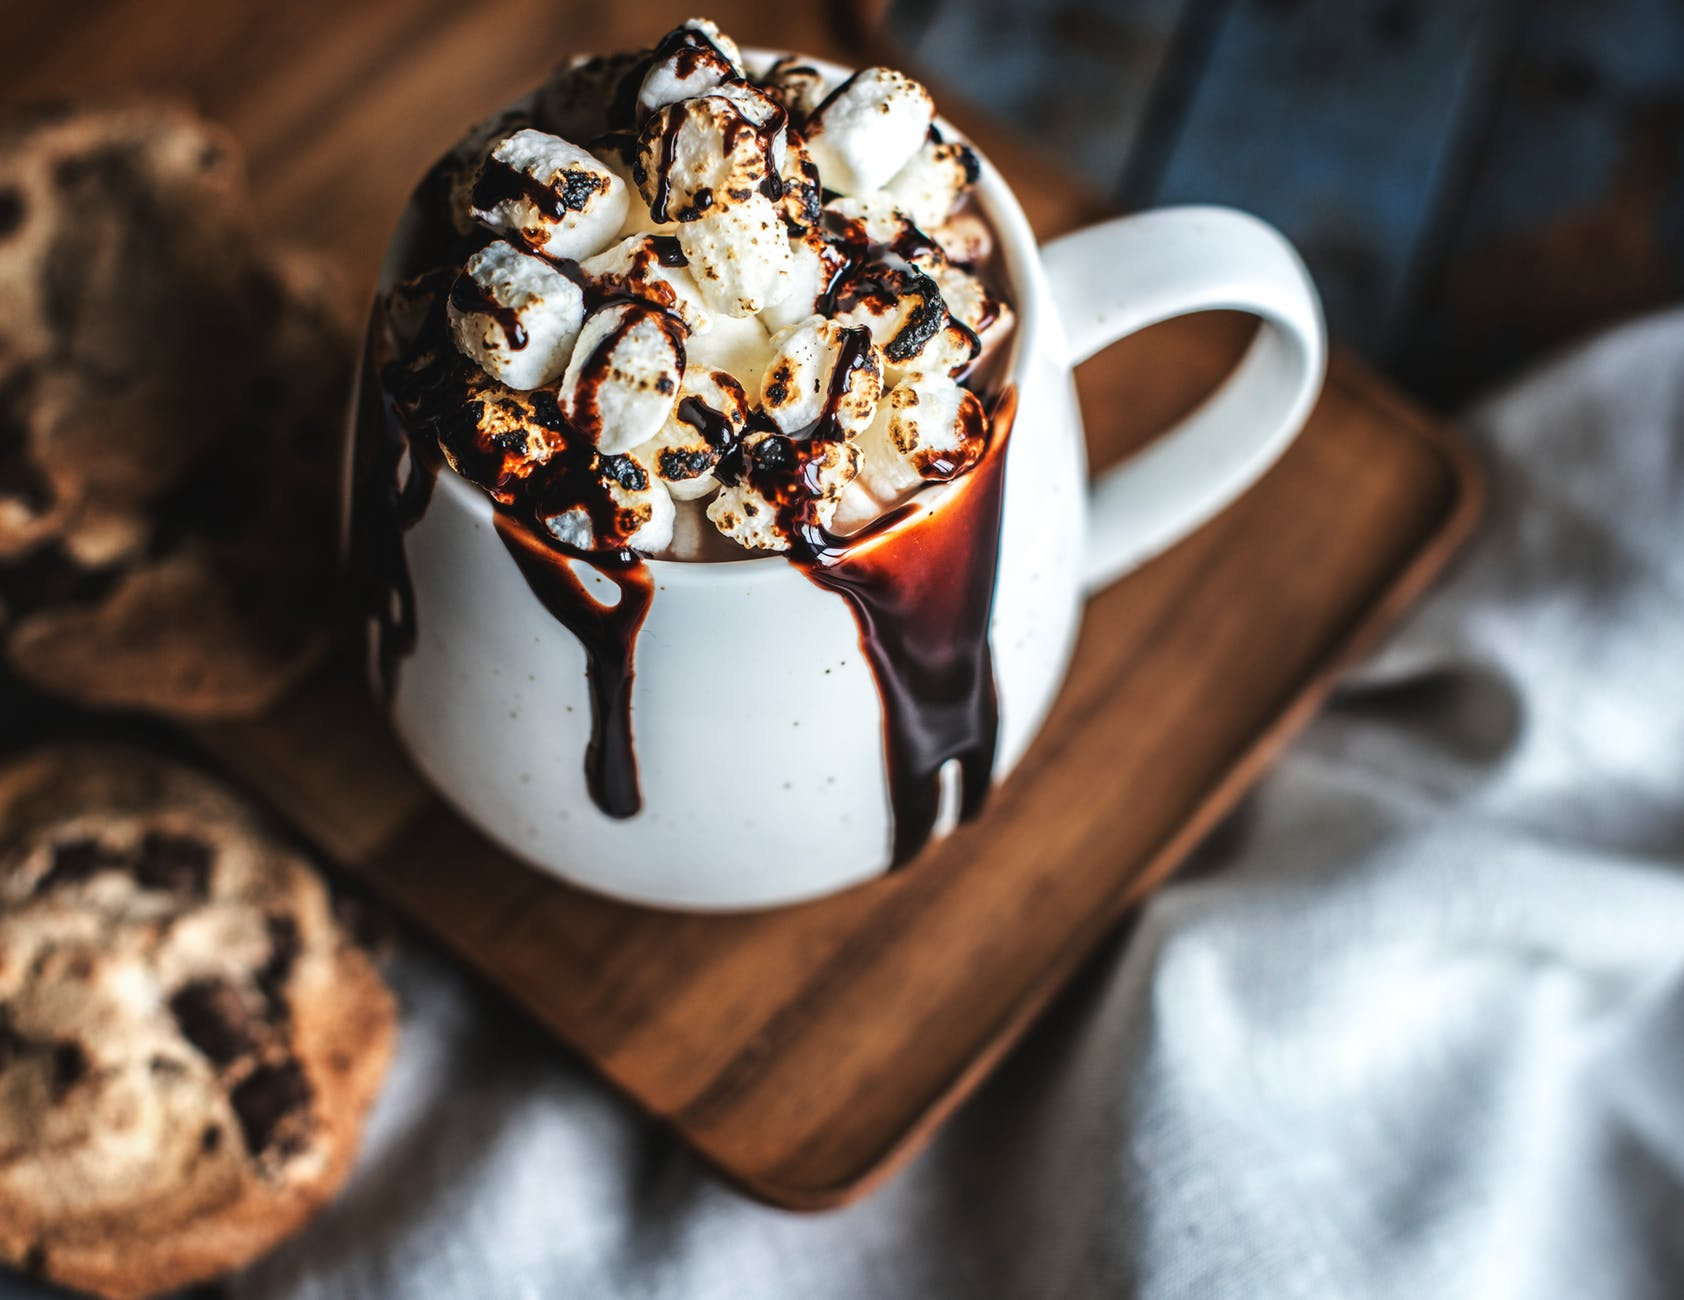 white ceramic mug filled with dessert